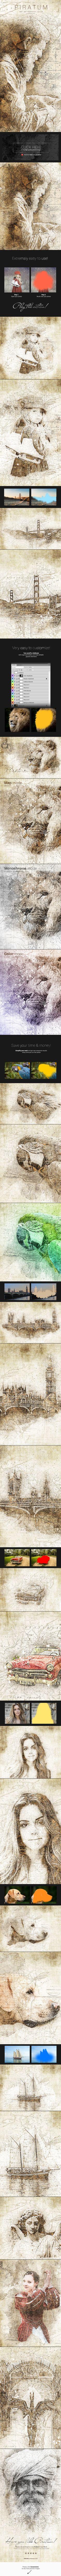 Piratum - Map Art Photoshop Action - Photo Effects Actions